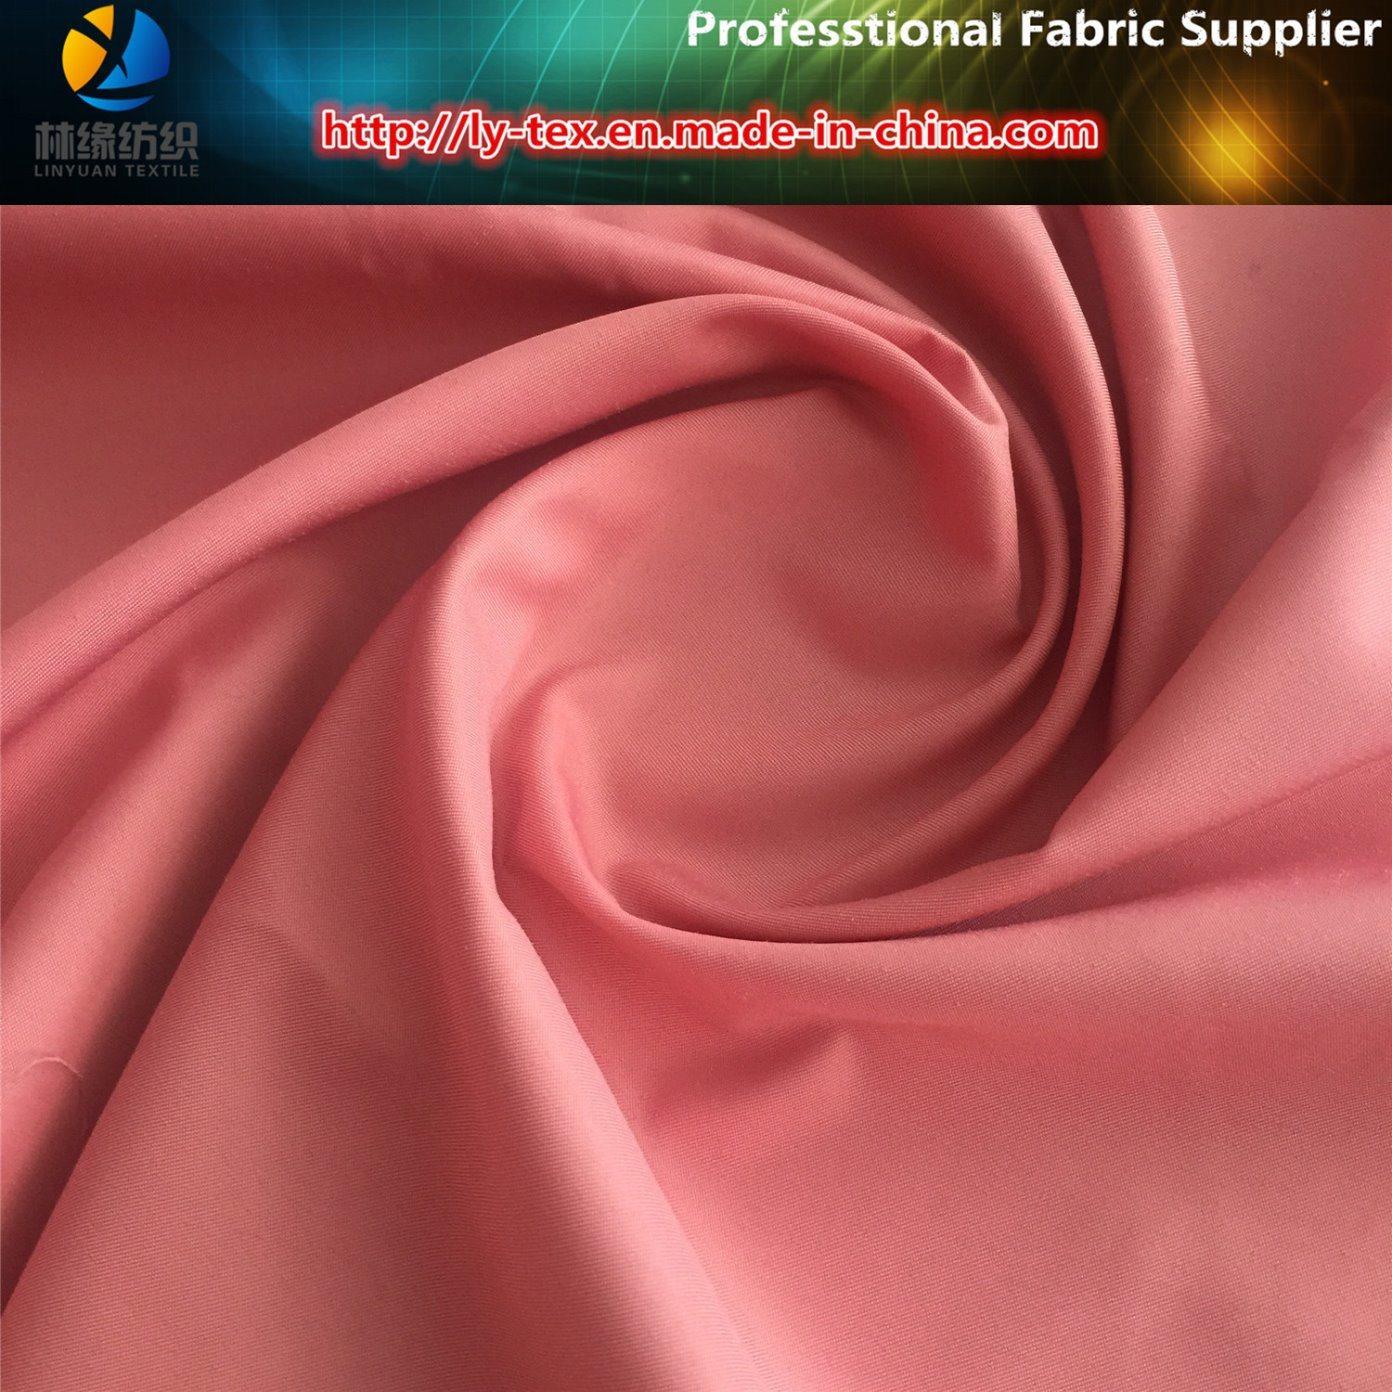 Polyester/Nylon Blended Twill Micro Fiber Fabric, Shirt Fabric